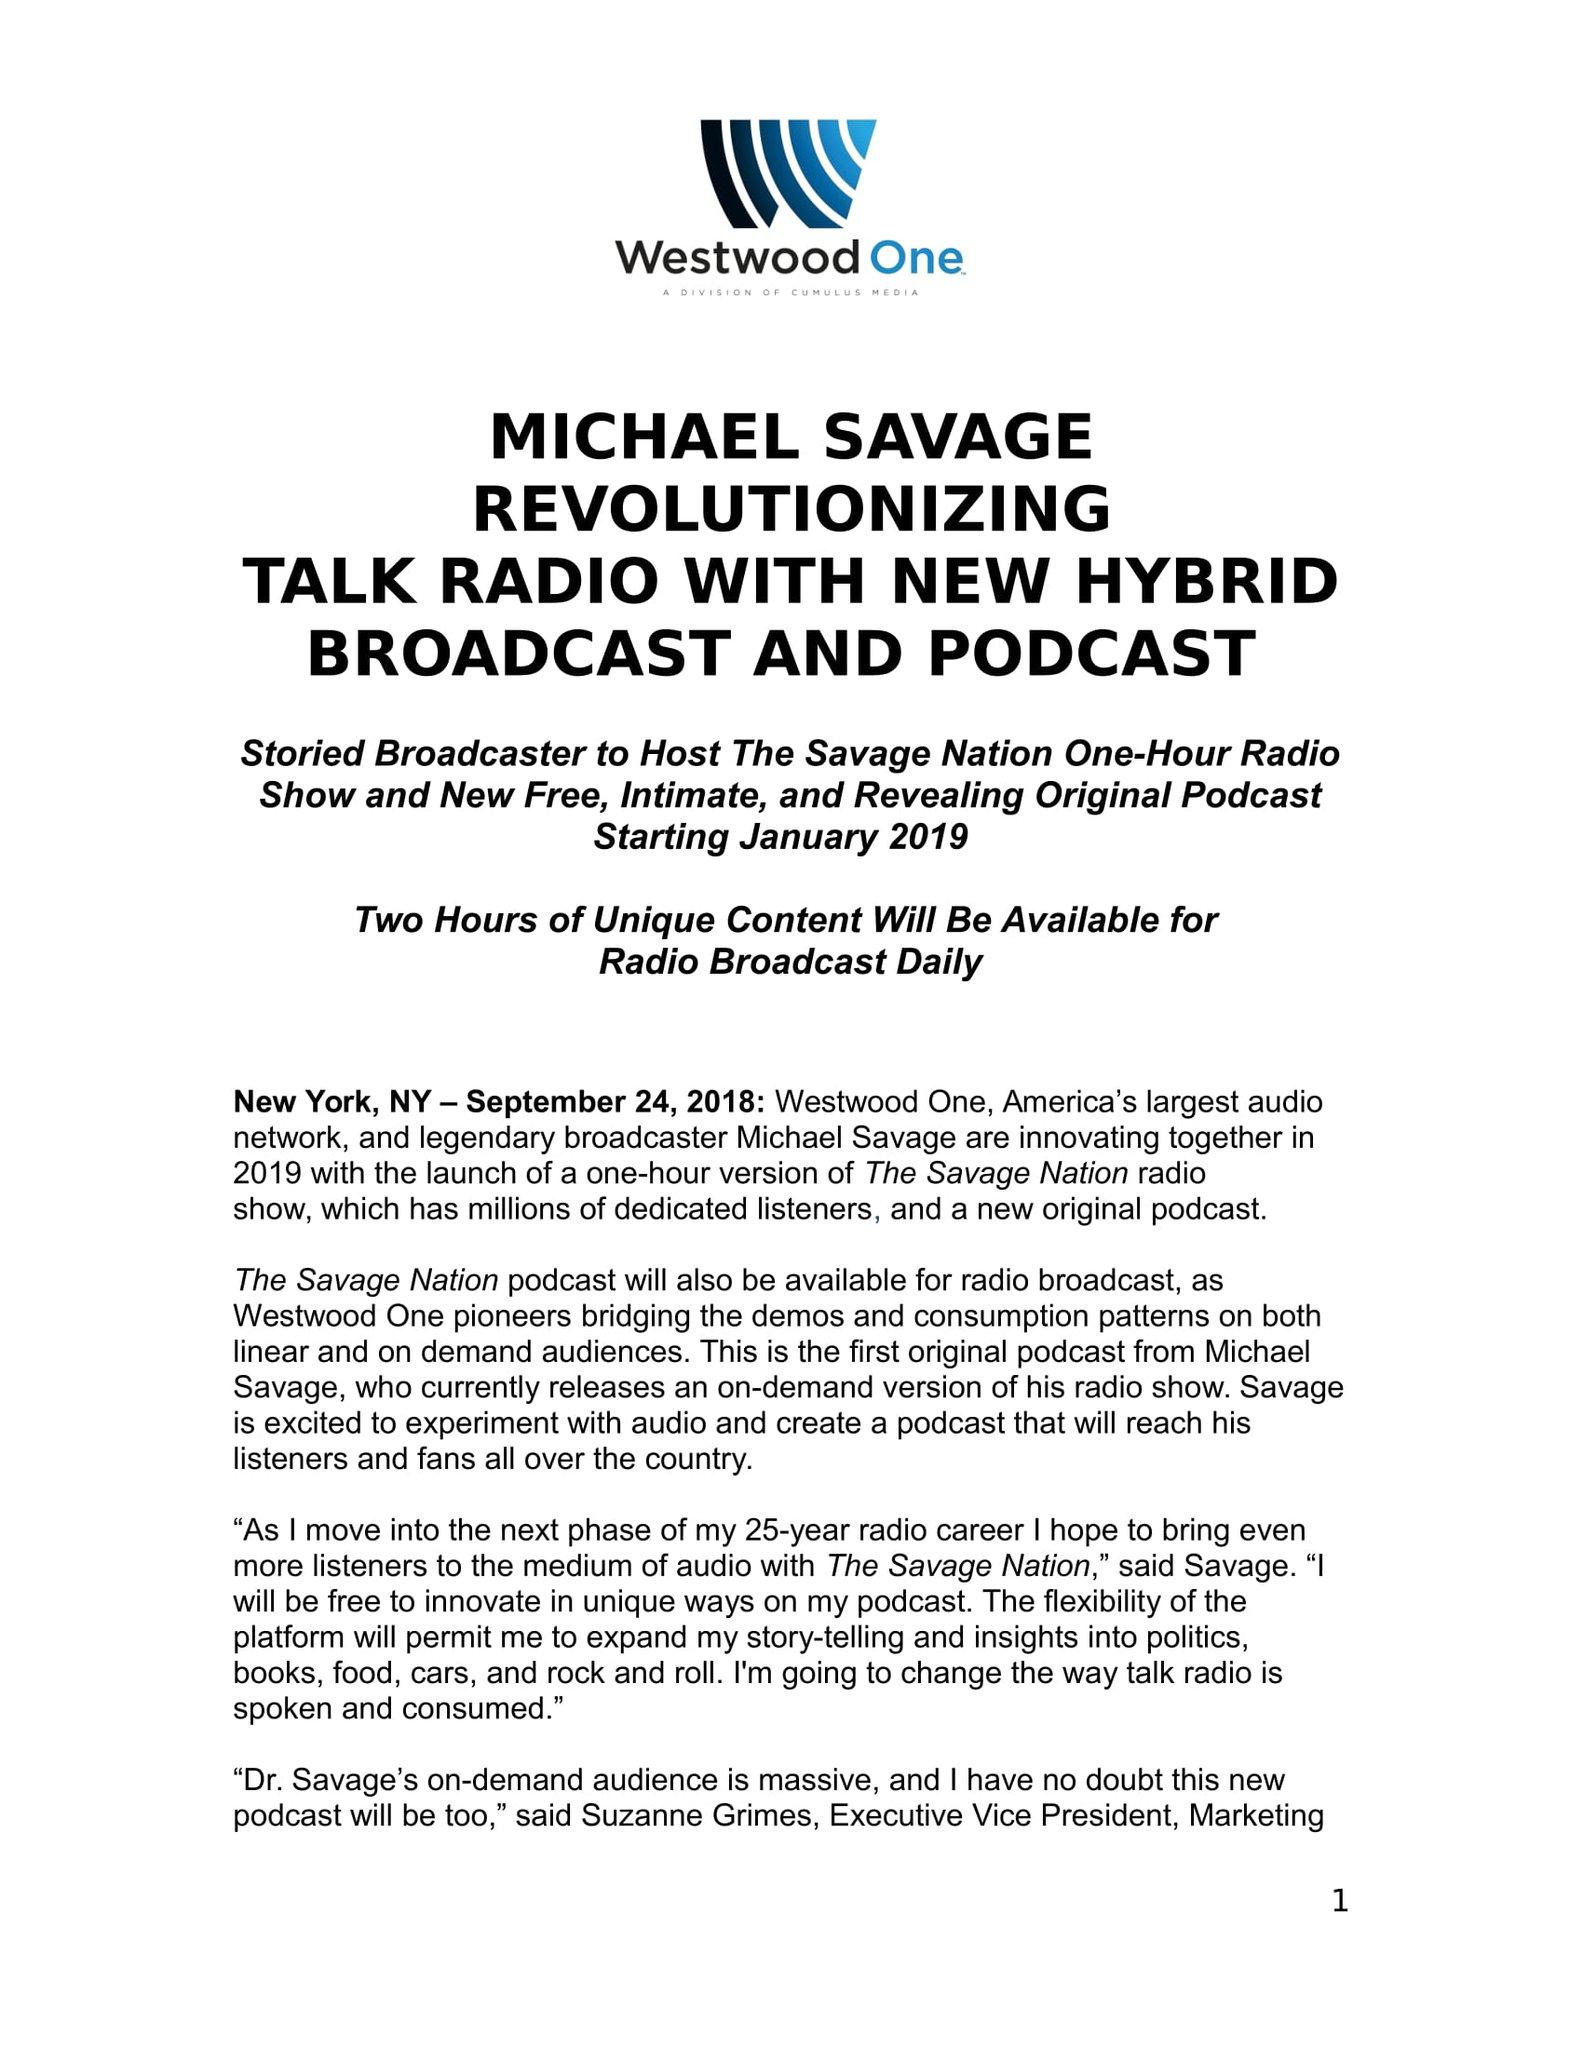 Michael Savage on Twitter: